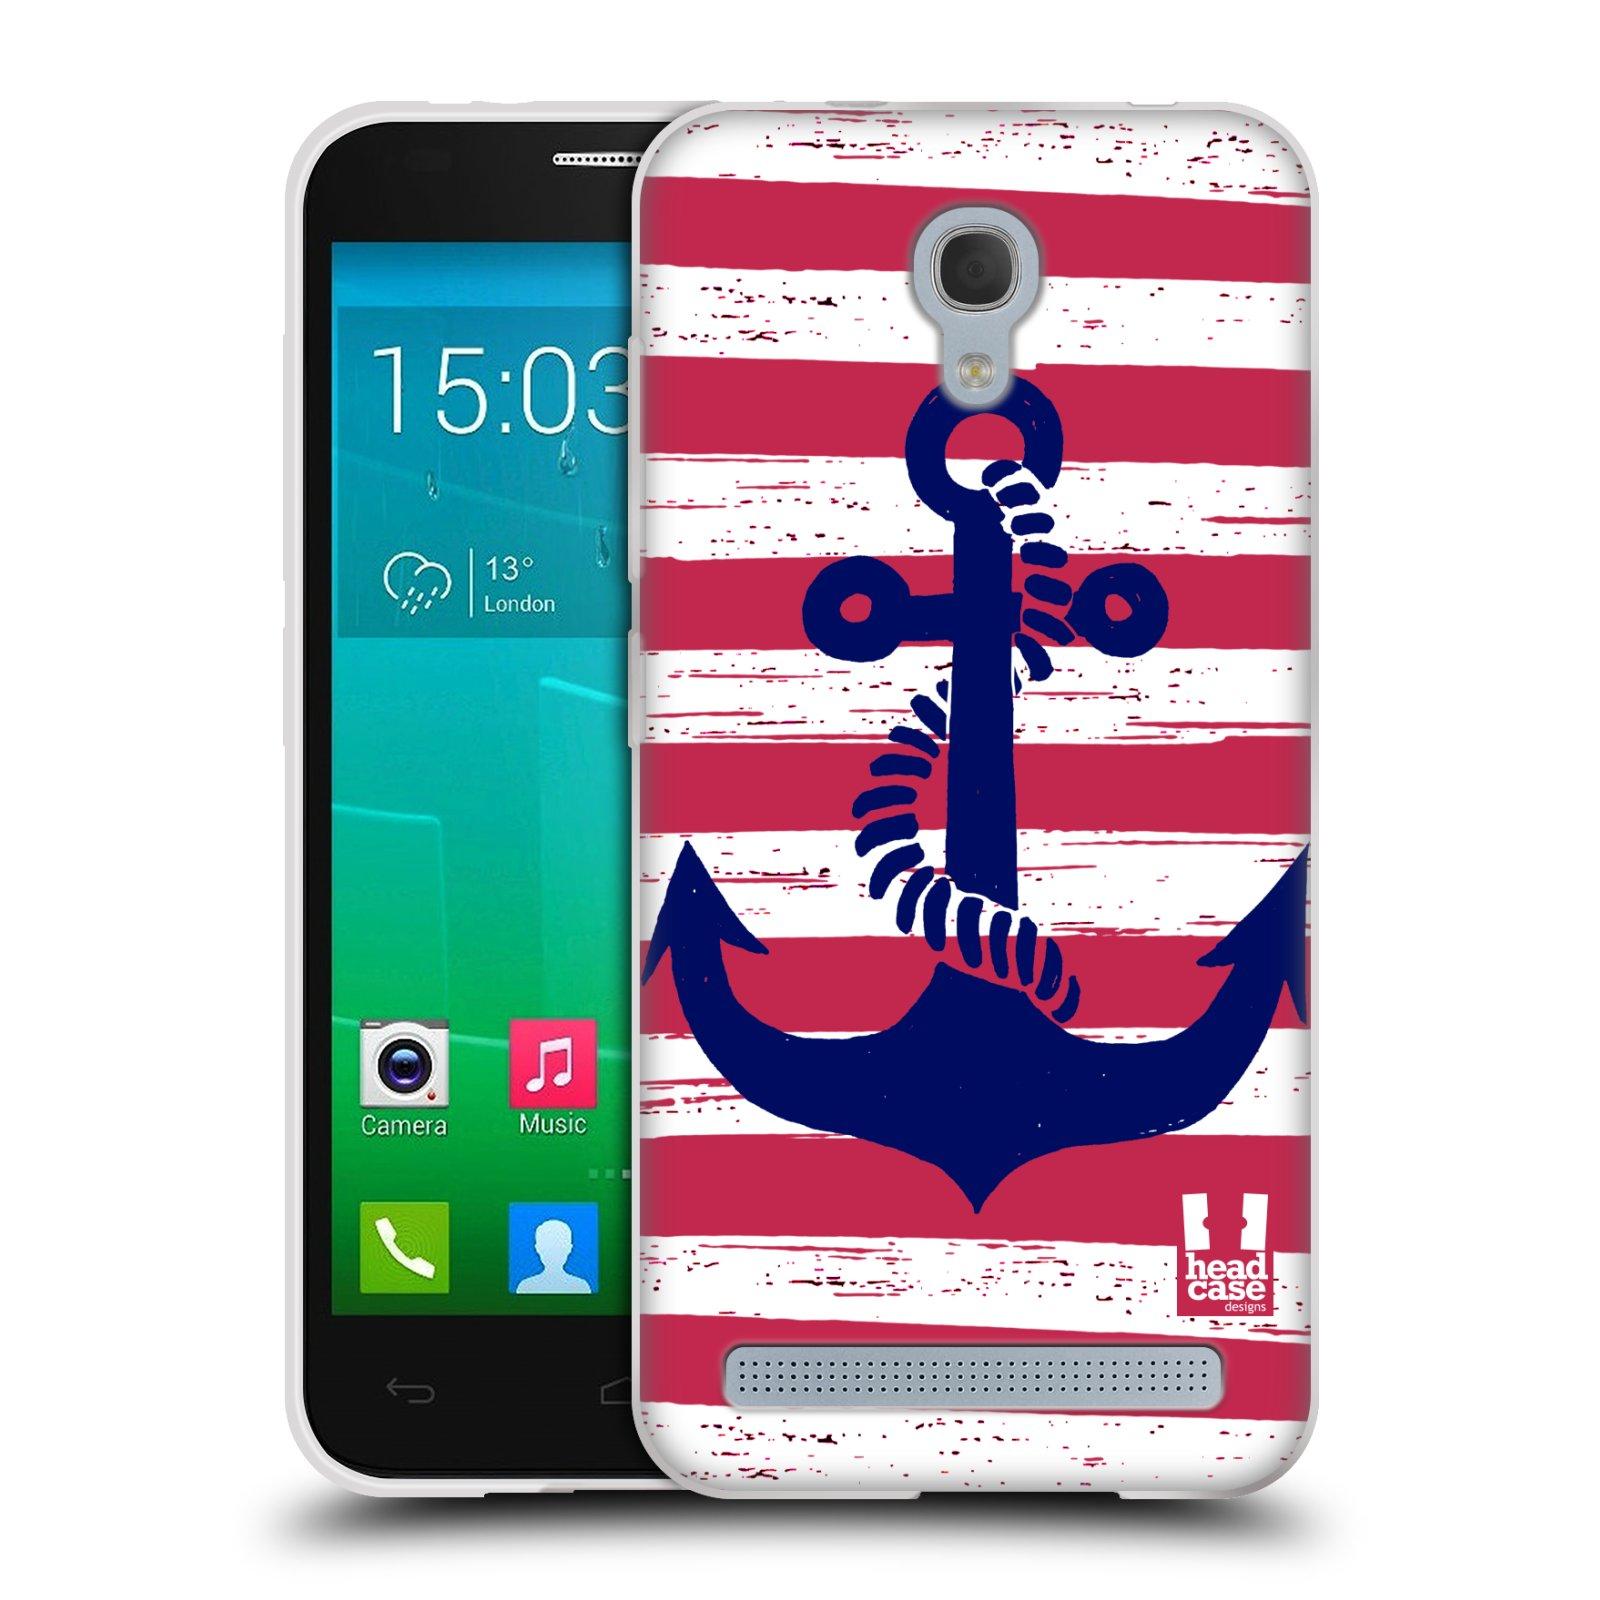 Silikonové pouzdro na mobil Alcatel One Touch Idol 2 Mini S 6036Y HEAD CASE KOTVA S PRUHY